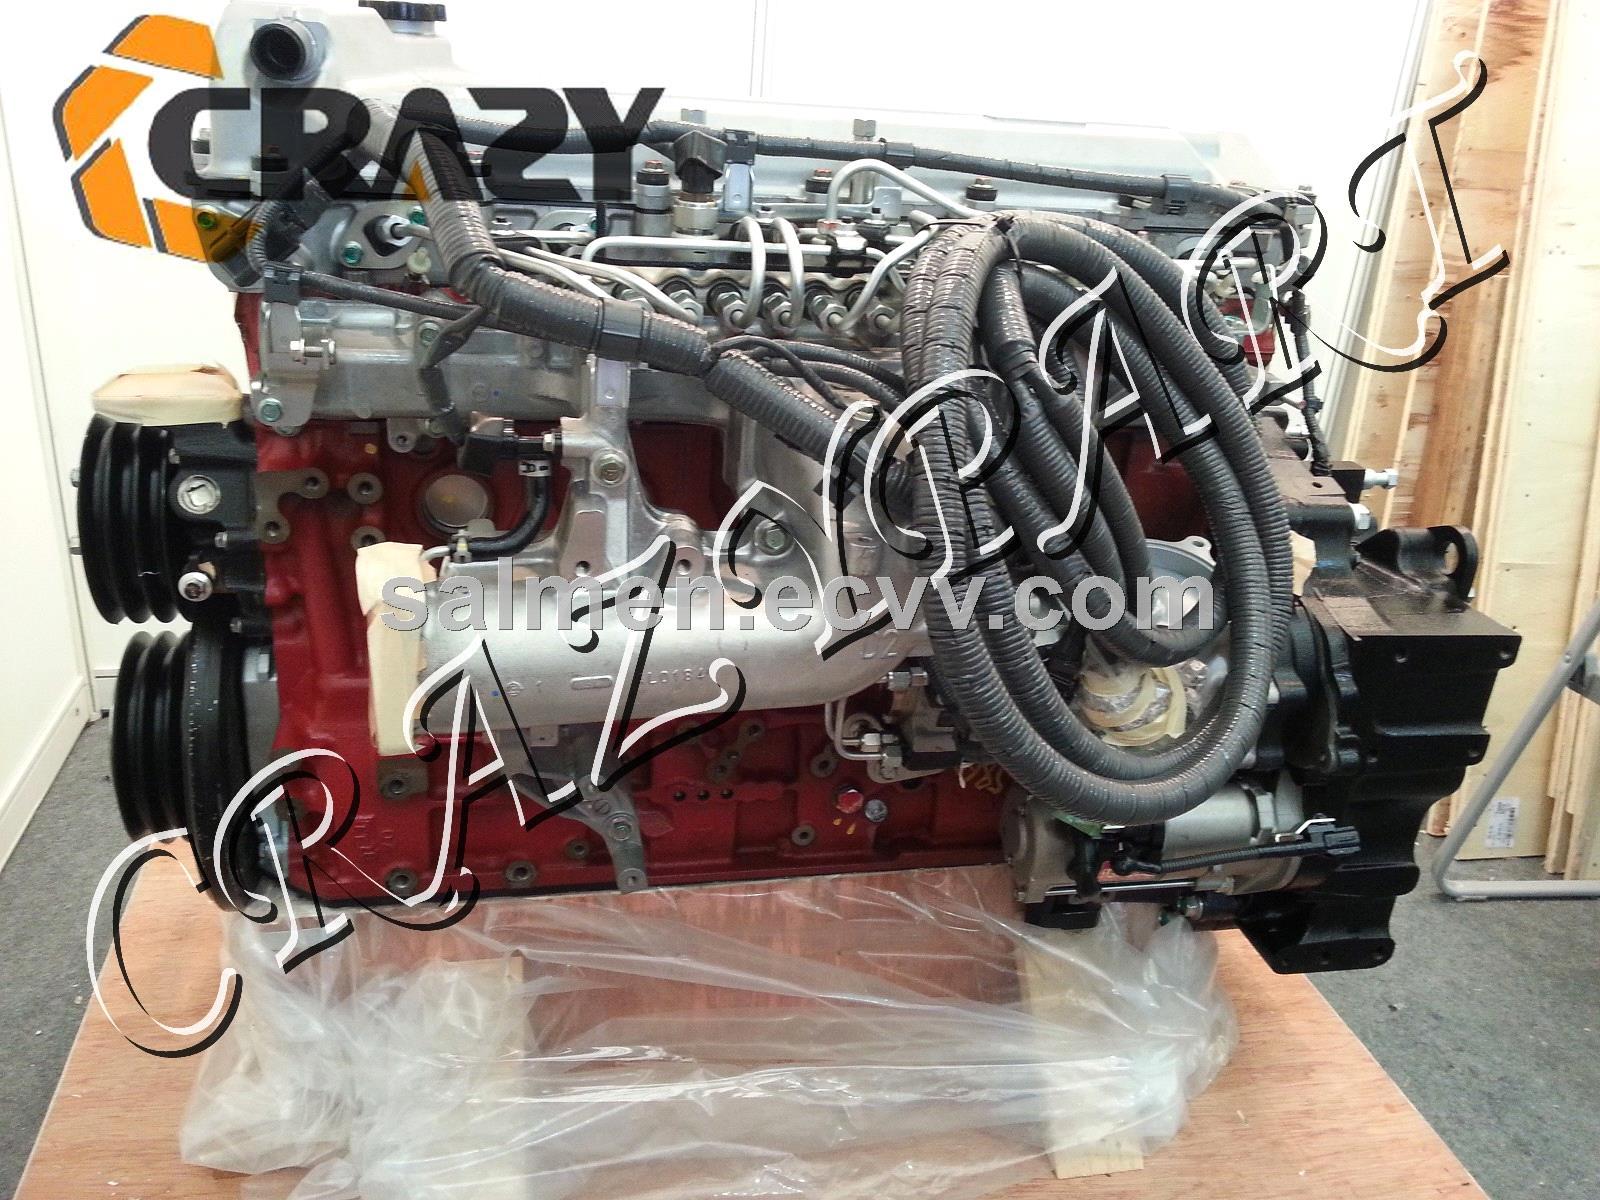 Hino Engine Parts : Hino j e complete engine assy excavator parts purchasing